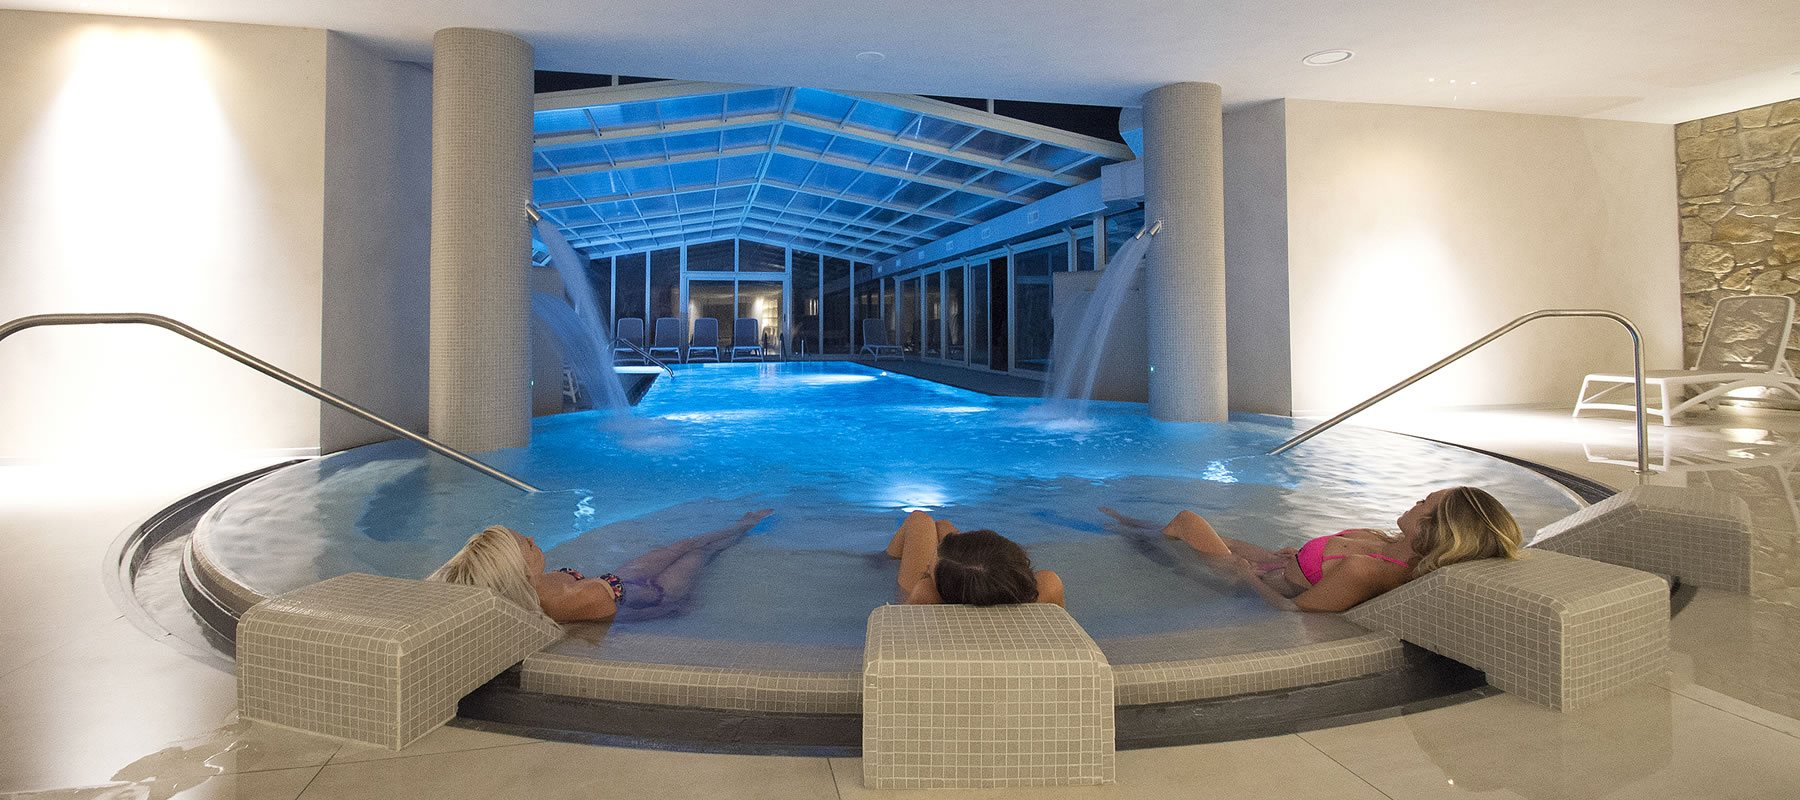 https://passeiosnatoscana.com/wp-content/uploads/2017/05/hotel-i-piastroni-maremma-toscana-centro-benessere.jpg